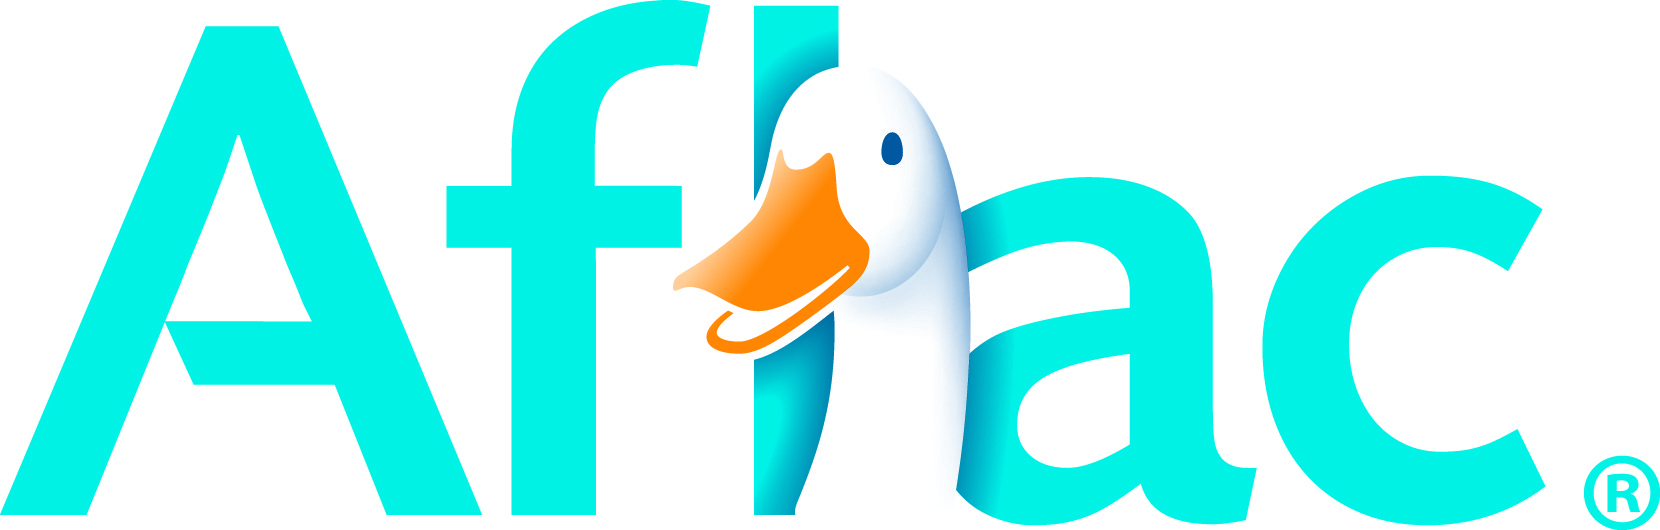 2018 Aflac Open Enrollment Media Relations Campaign- Logo